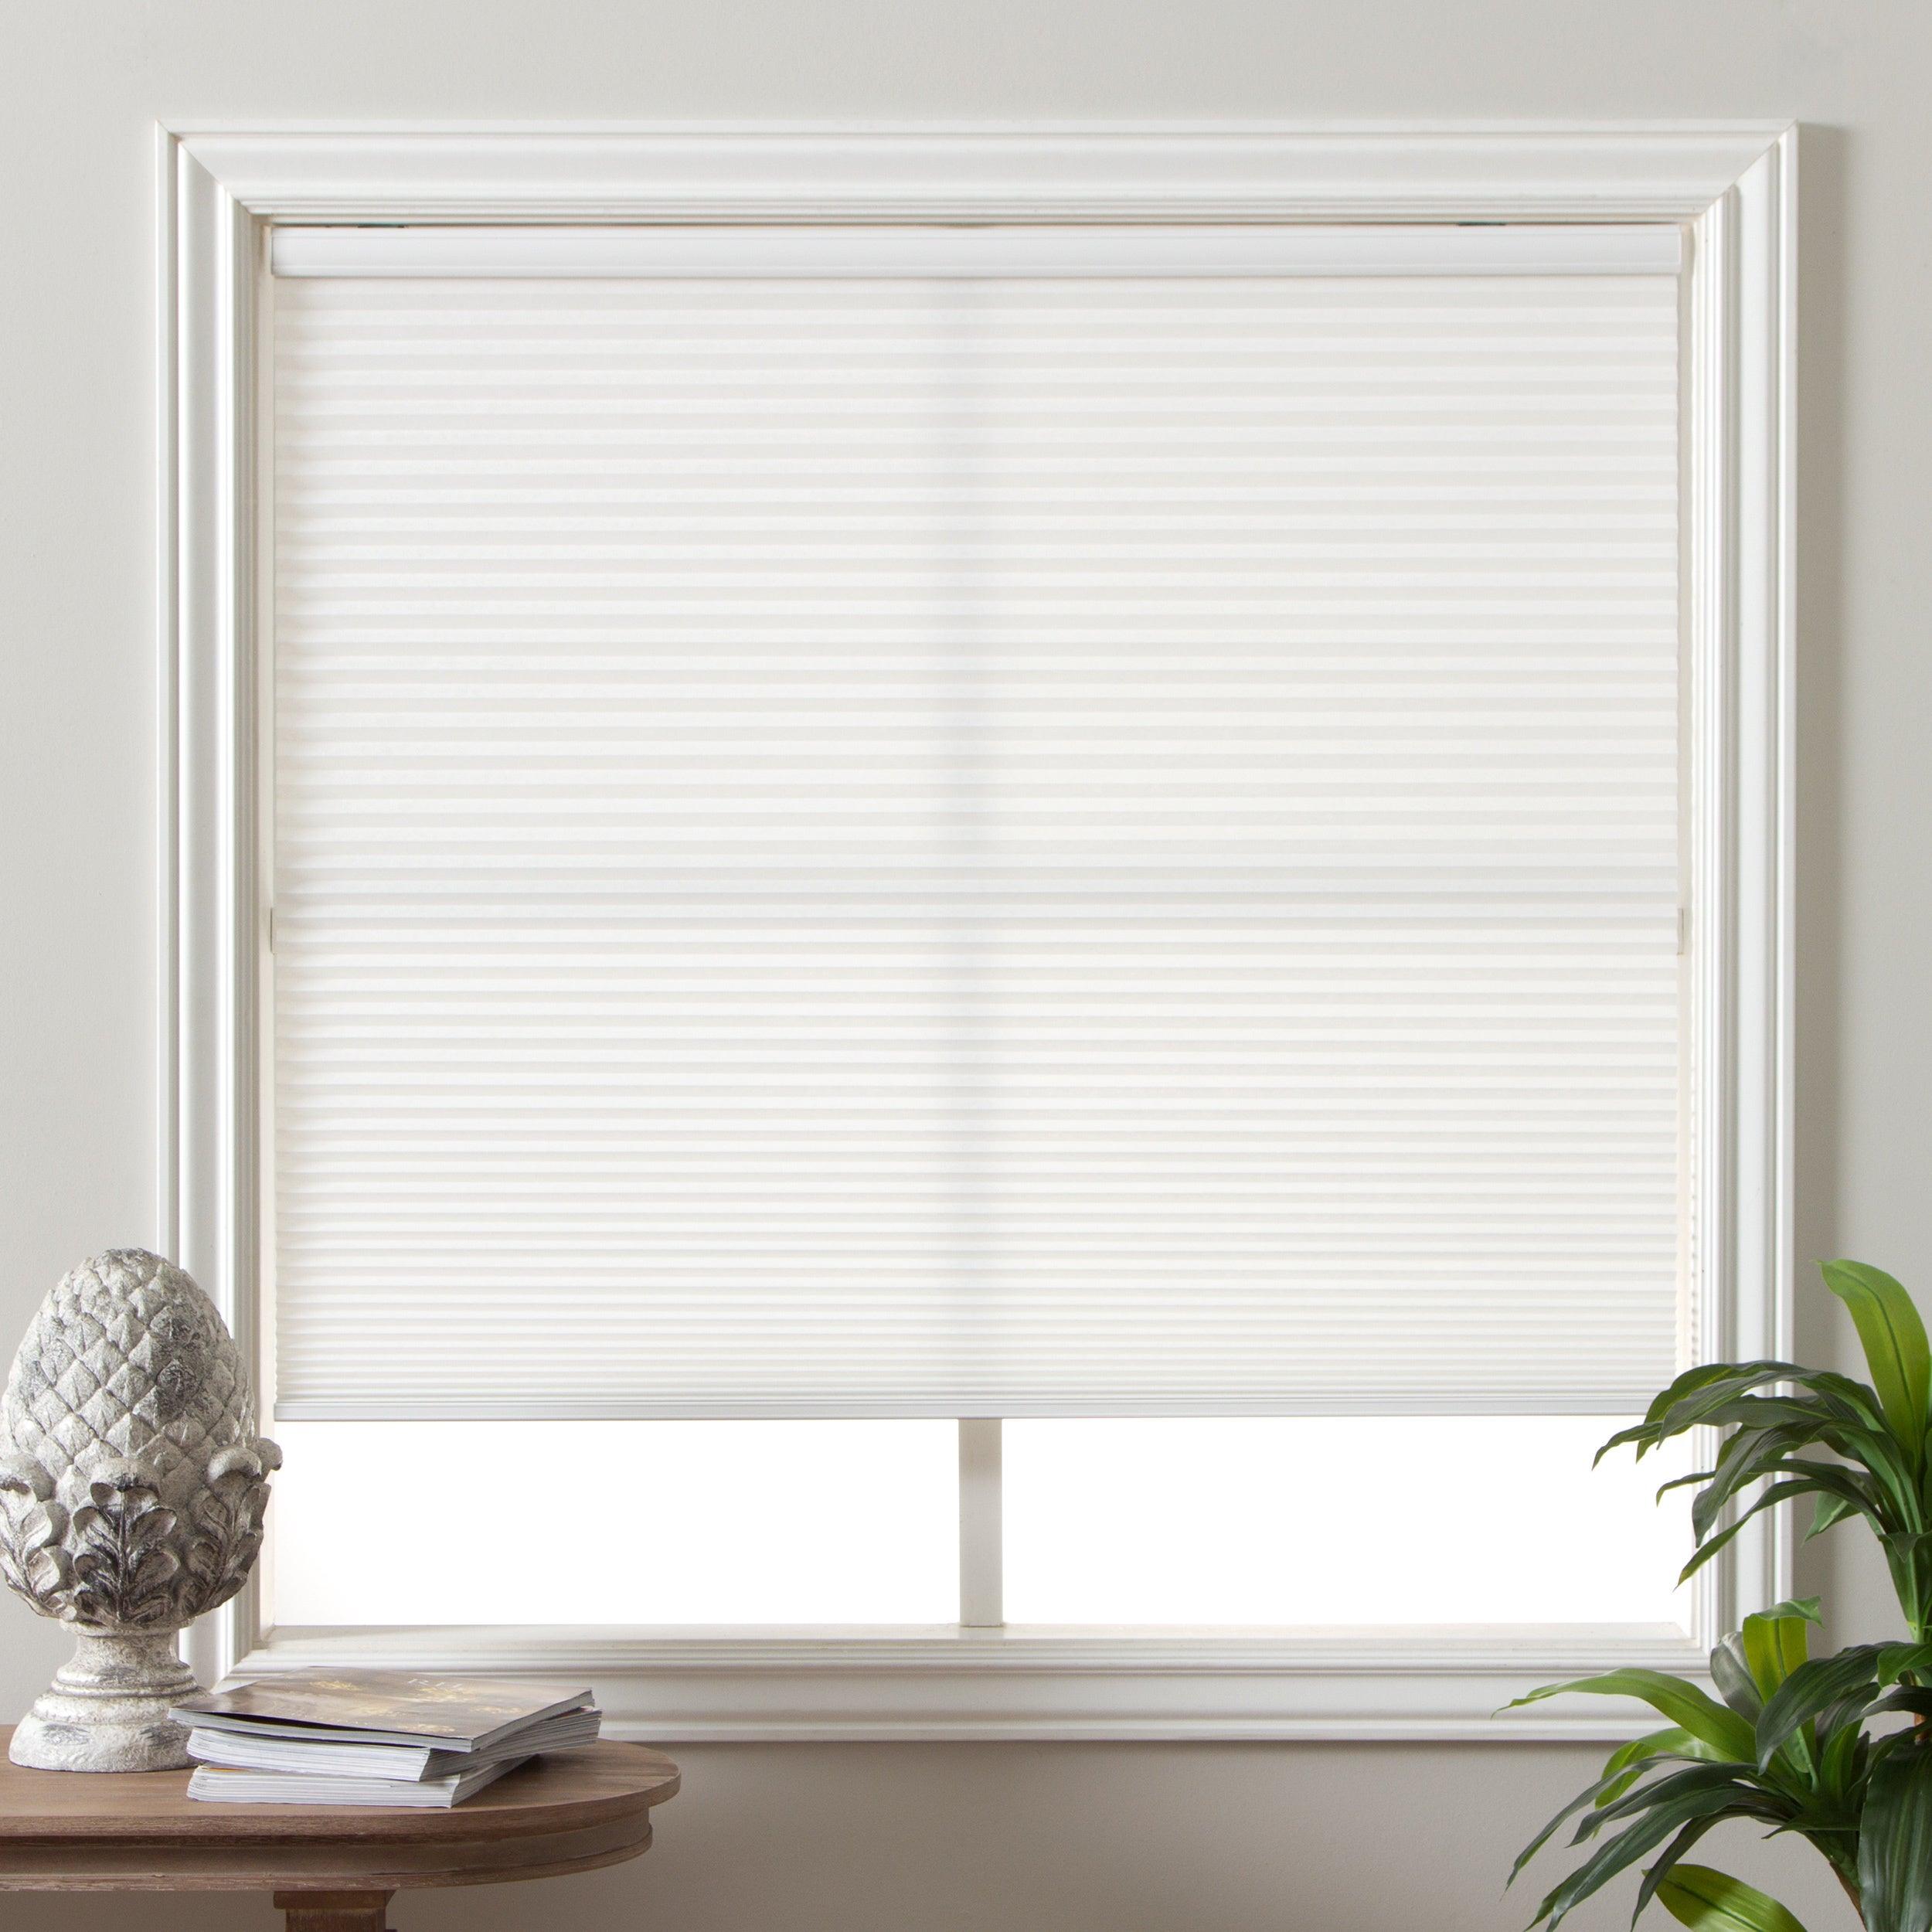 cordless light filtering window blinds cellular shade honeycomb design white new ebay. Black Bedroom Furniture Sets. Home Design Ideas